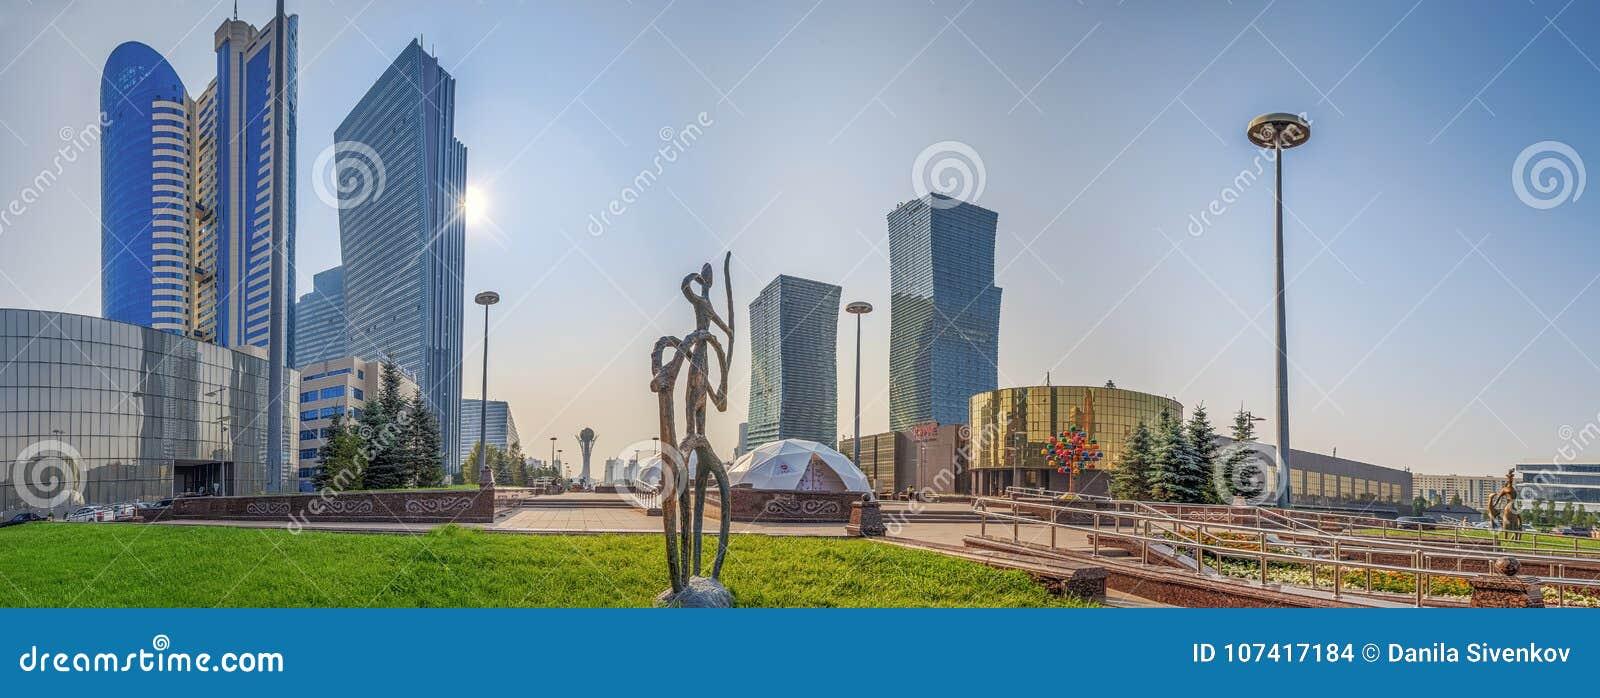 АСТАНА, КАЗАХСТАН - 7-ОЕ ИЮЛЯ 2016: Панорама утра вод-зеленого бульвара